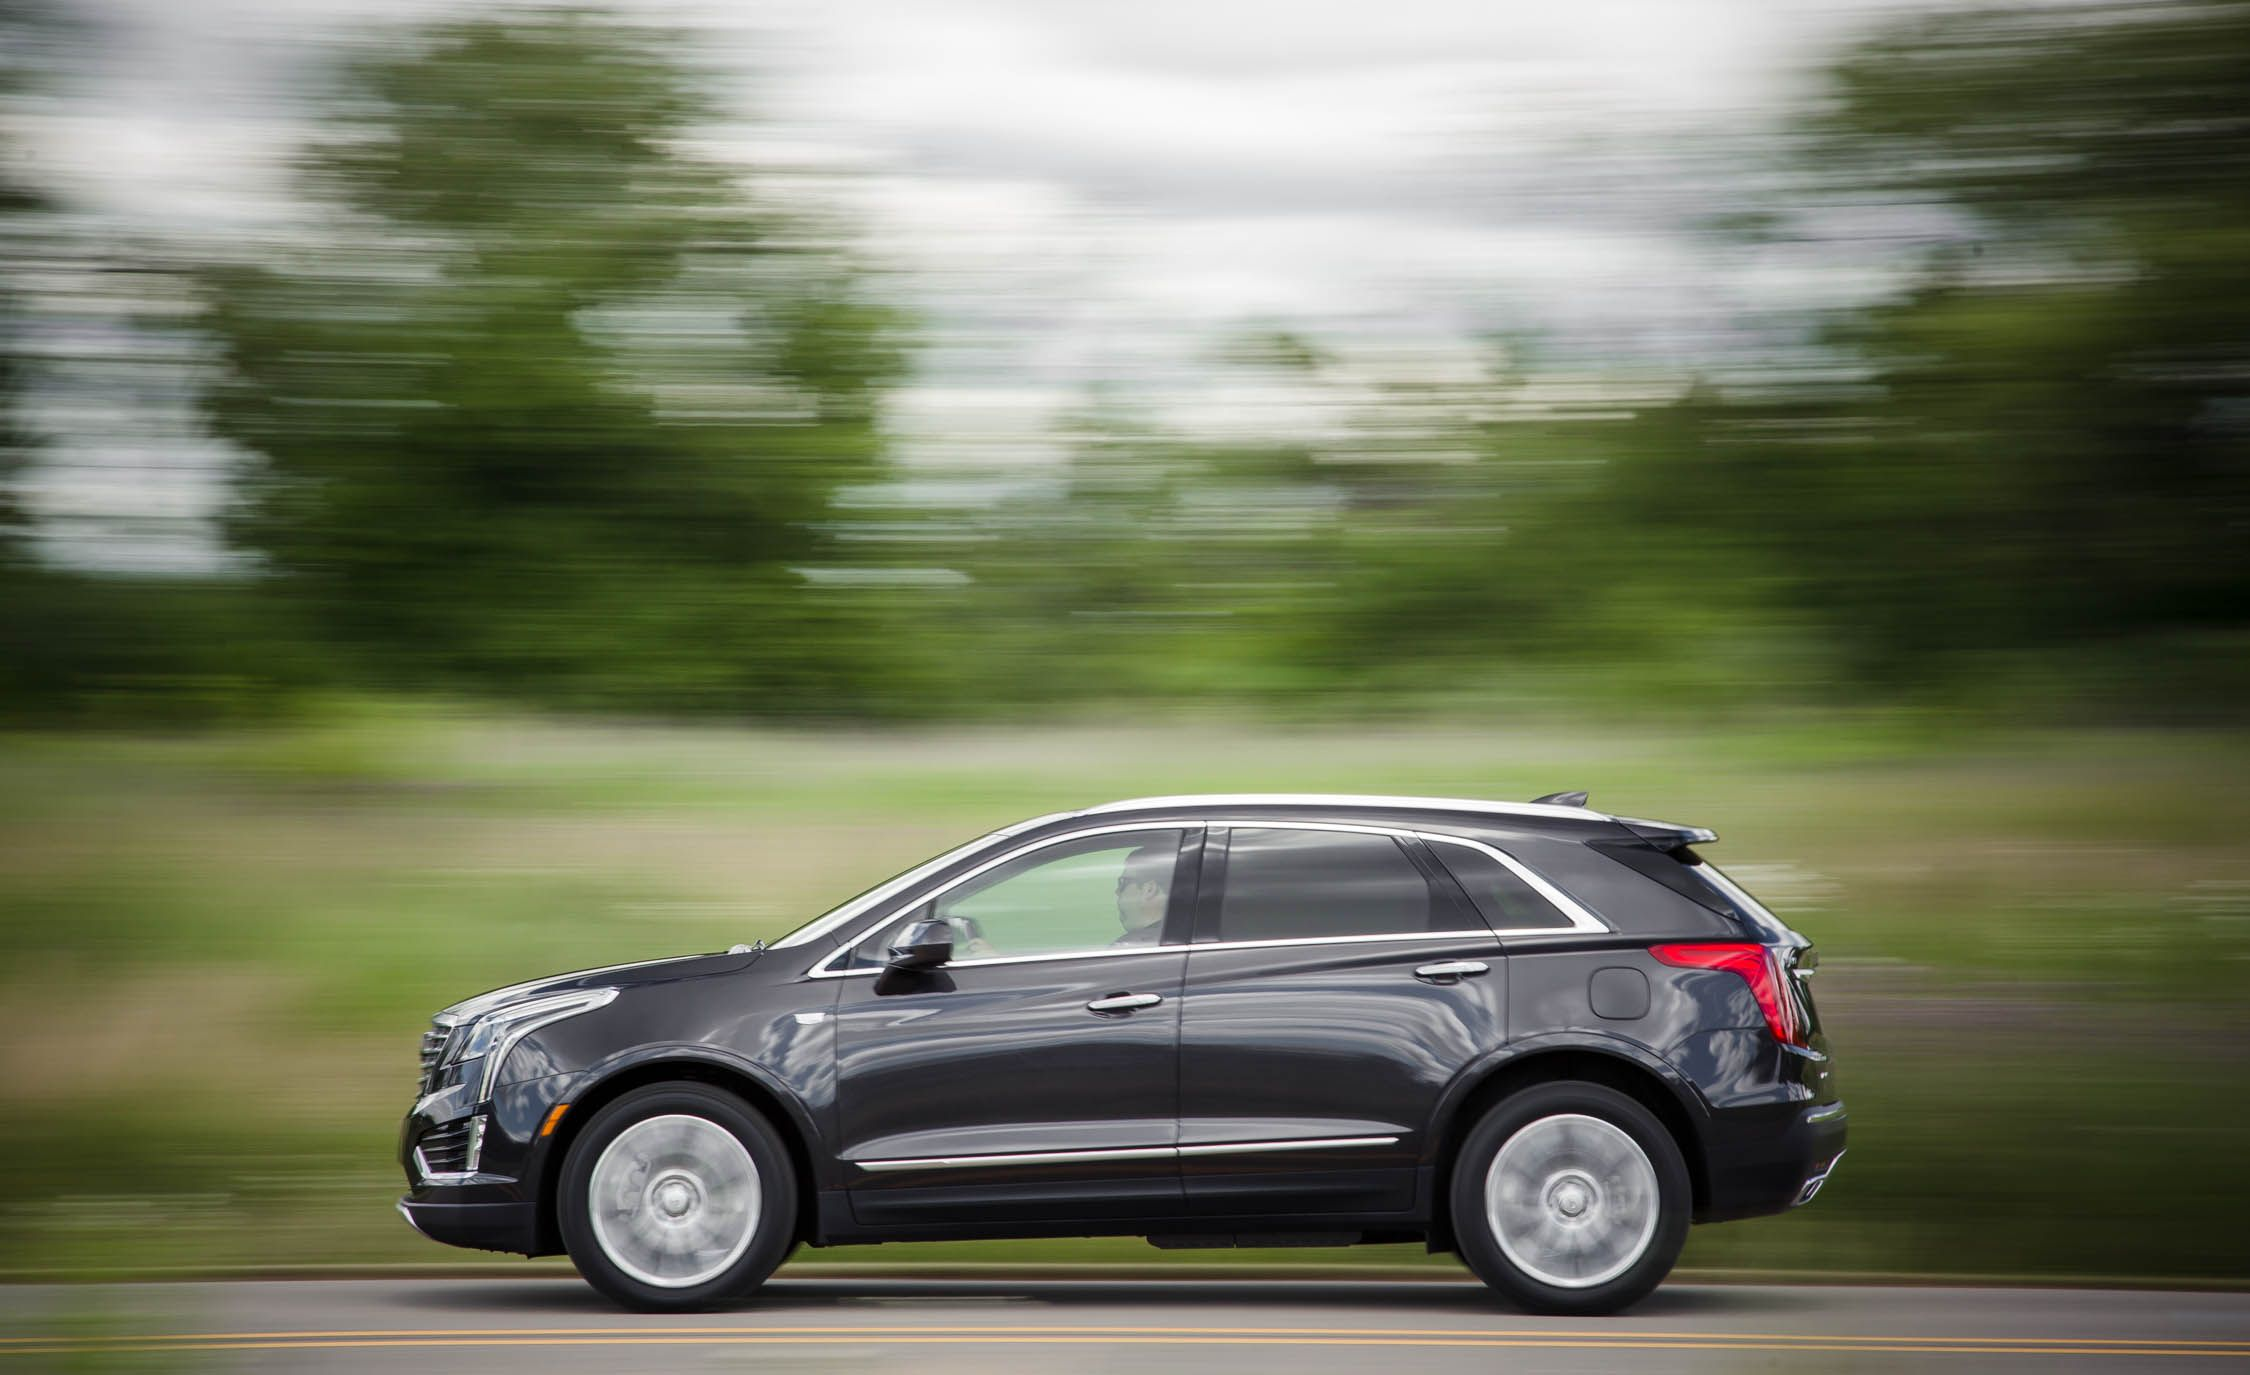 2019 Cadillac Xt5 Reviews Cadillac Xt5 Price Photos And Specs